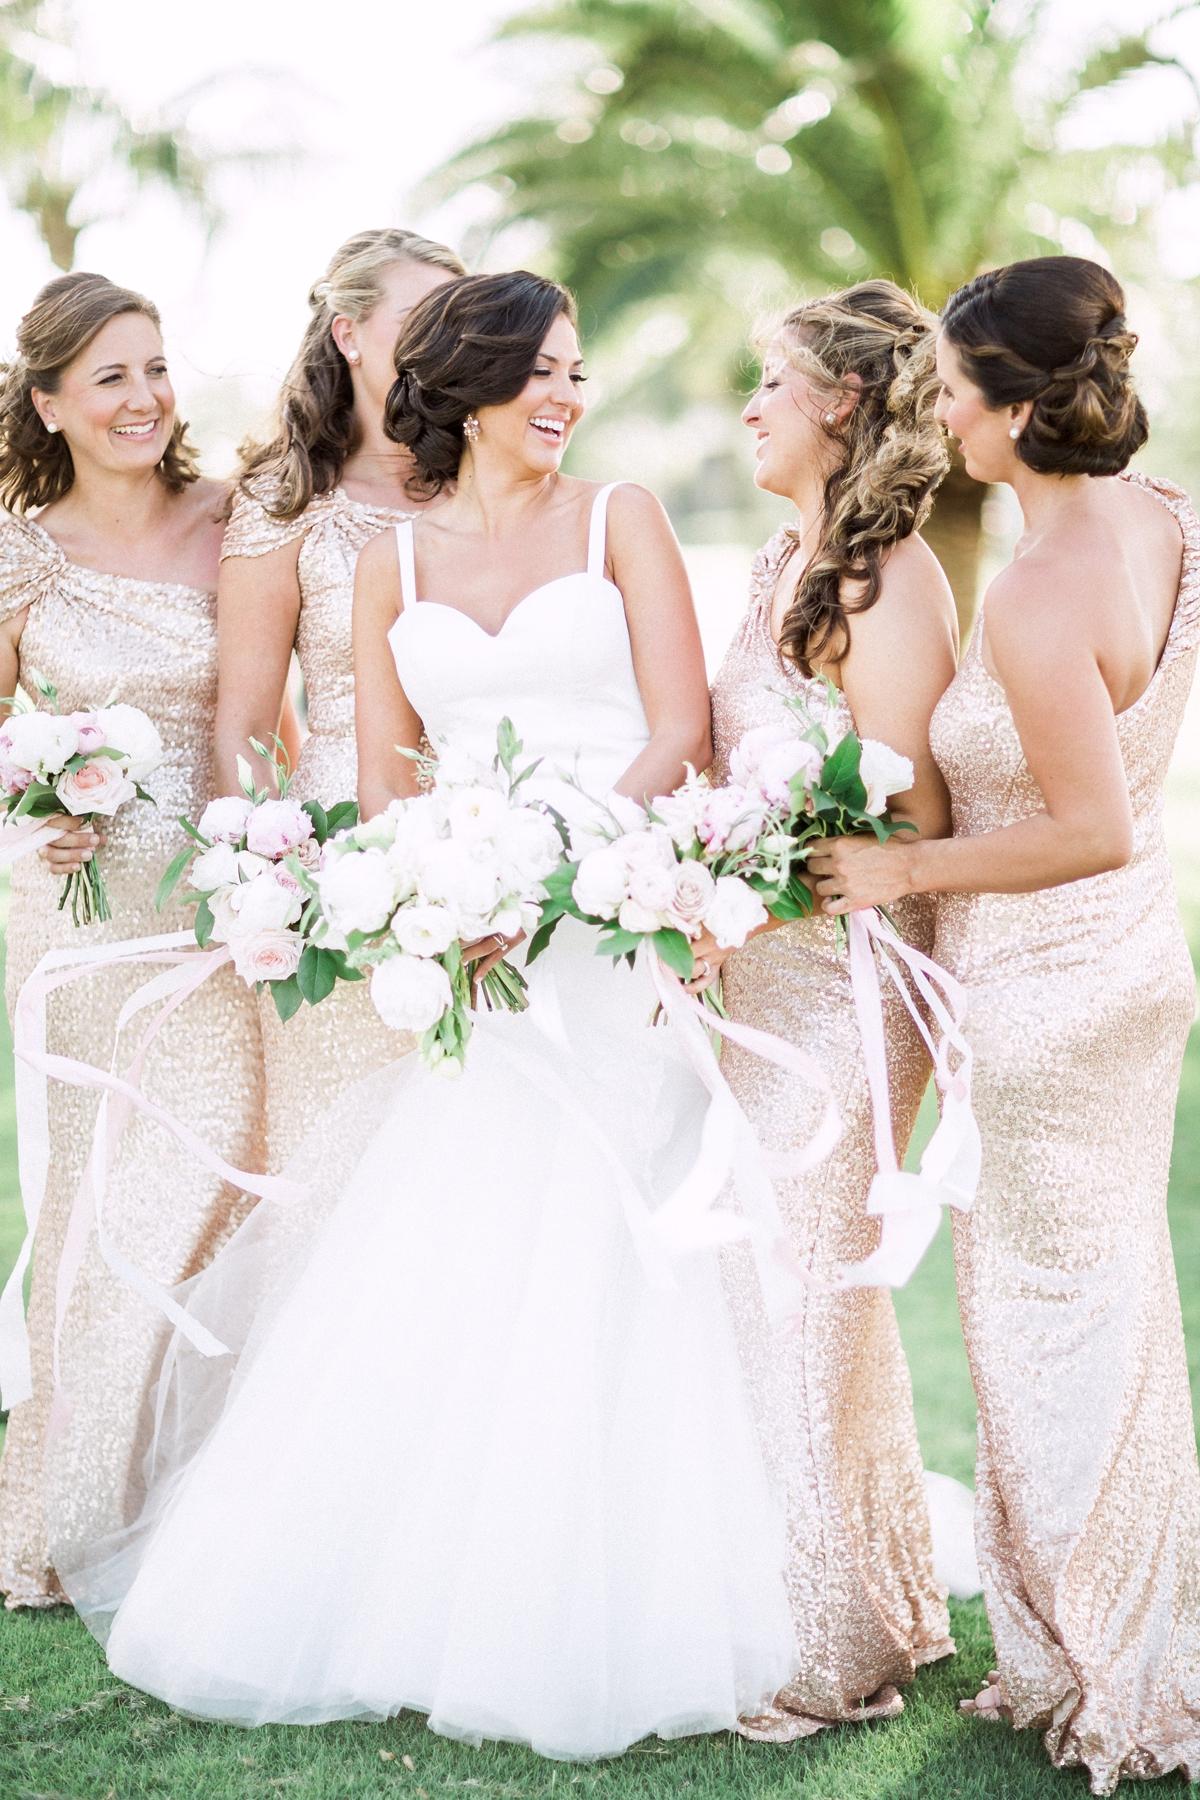 Gasparilla Inn-Boca Grande Wedding Photographer._0326.jpg